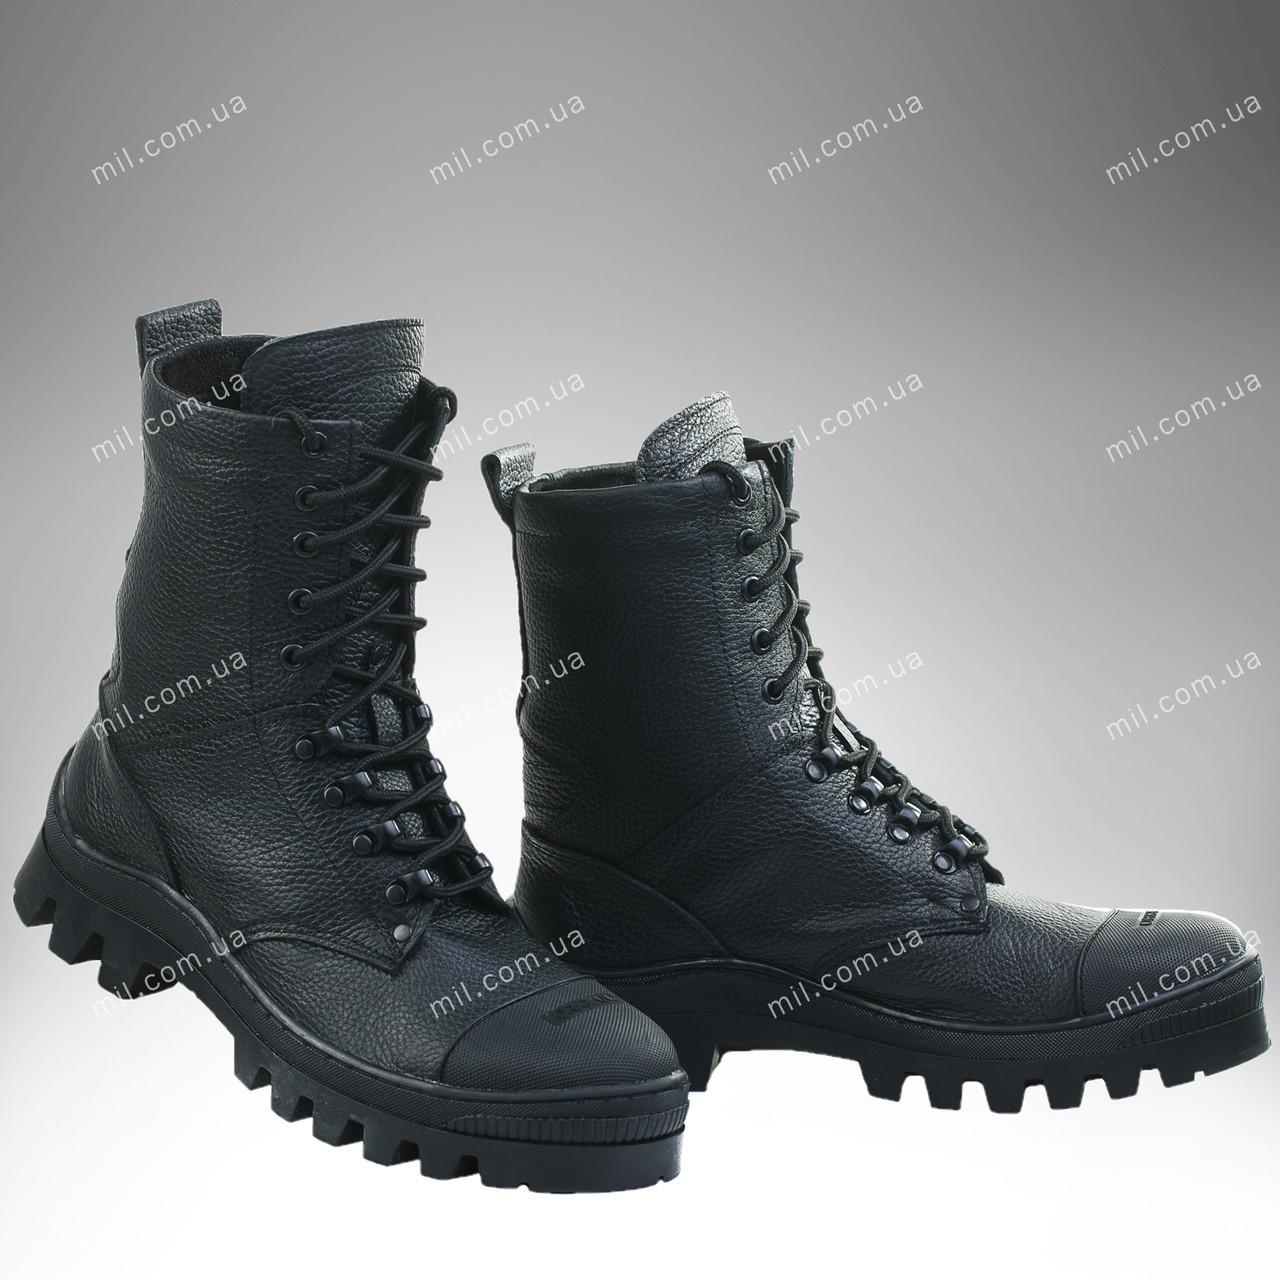 Берцы зимние / военная, армейская обувь БАСТИОН III (флотар)